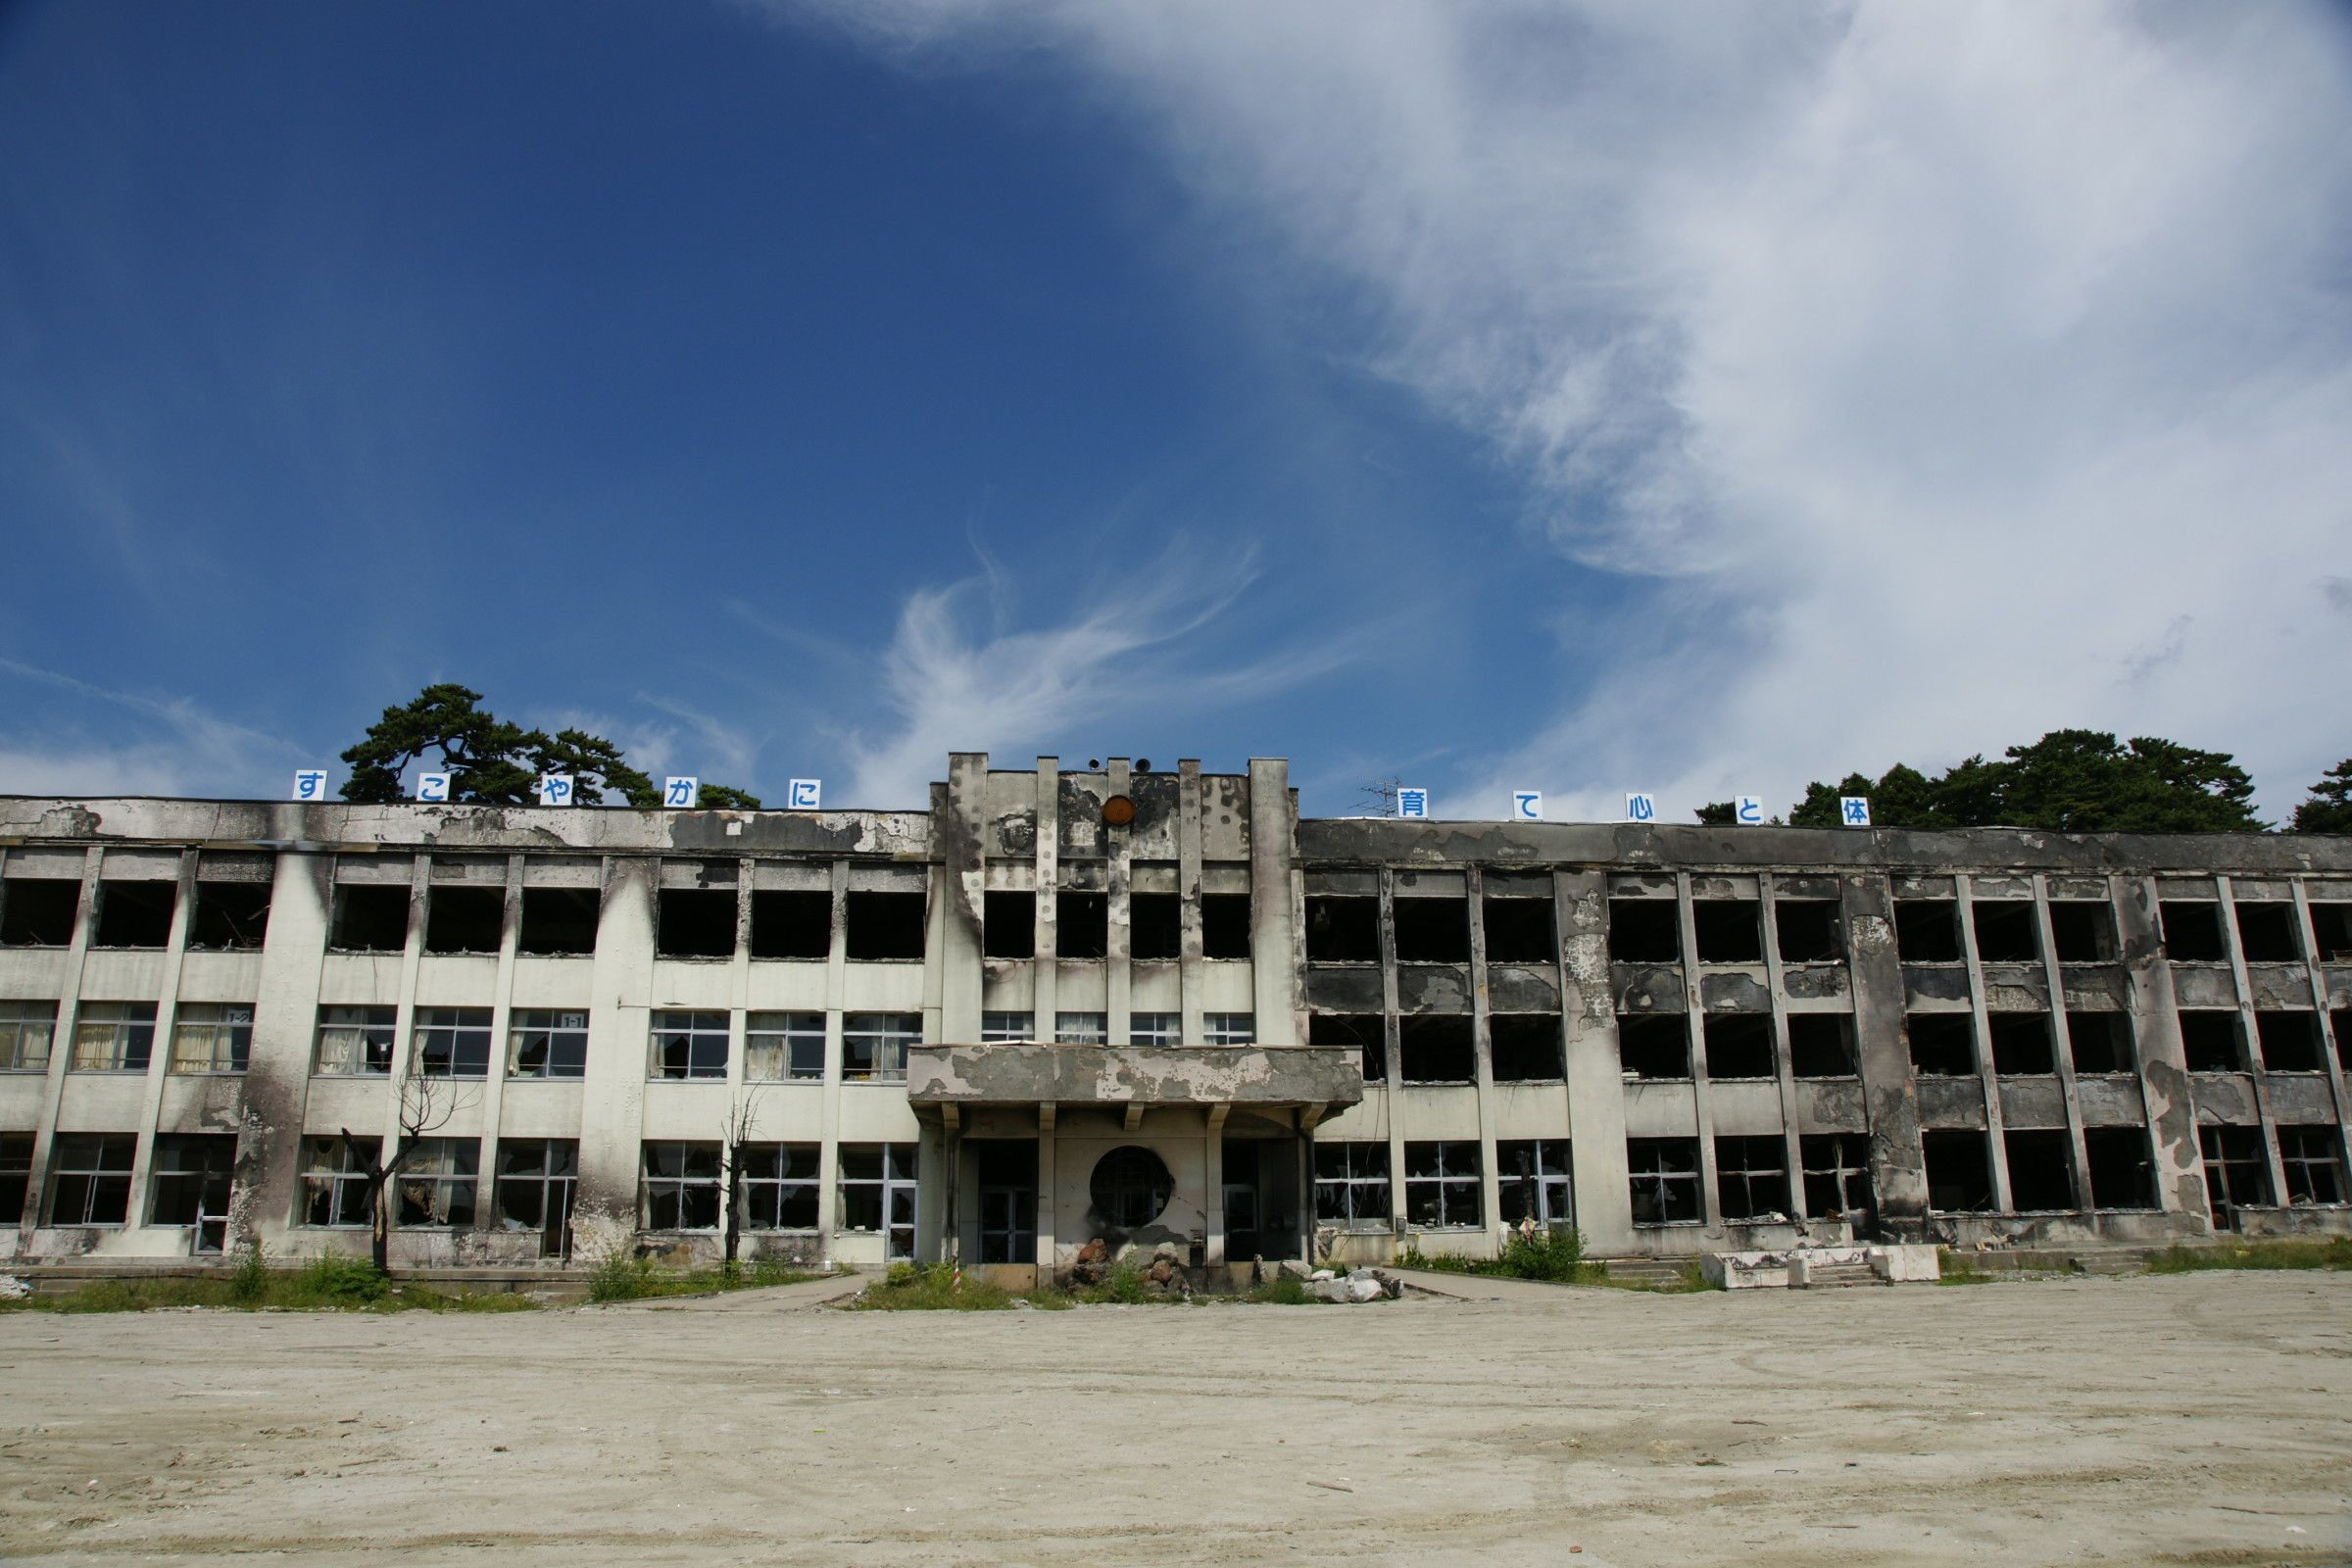 Kado no Maki elementary school